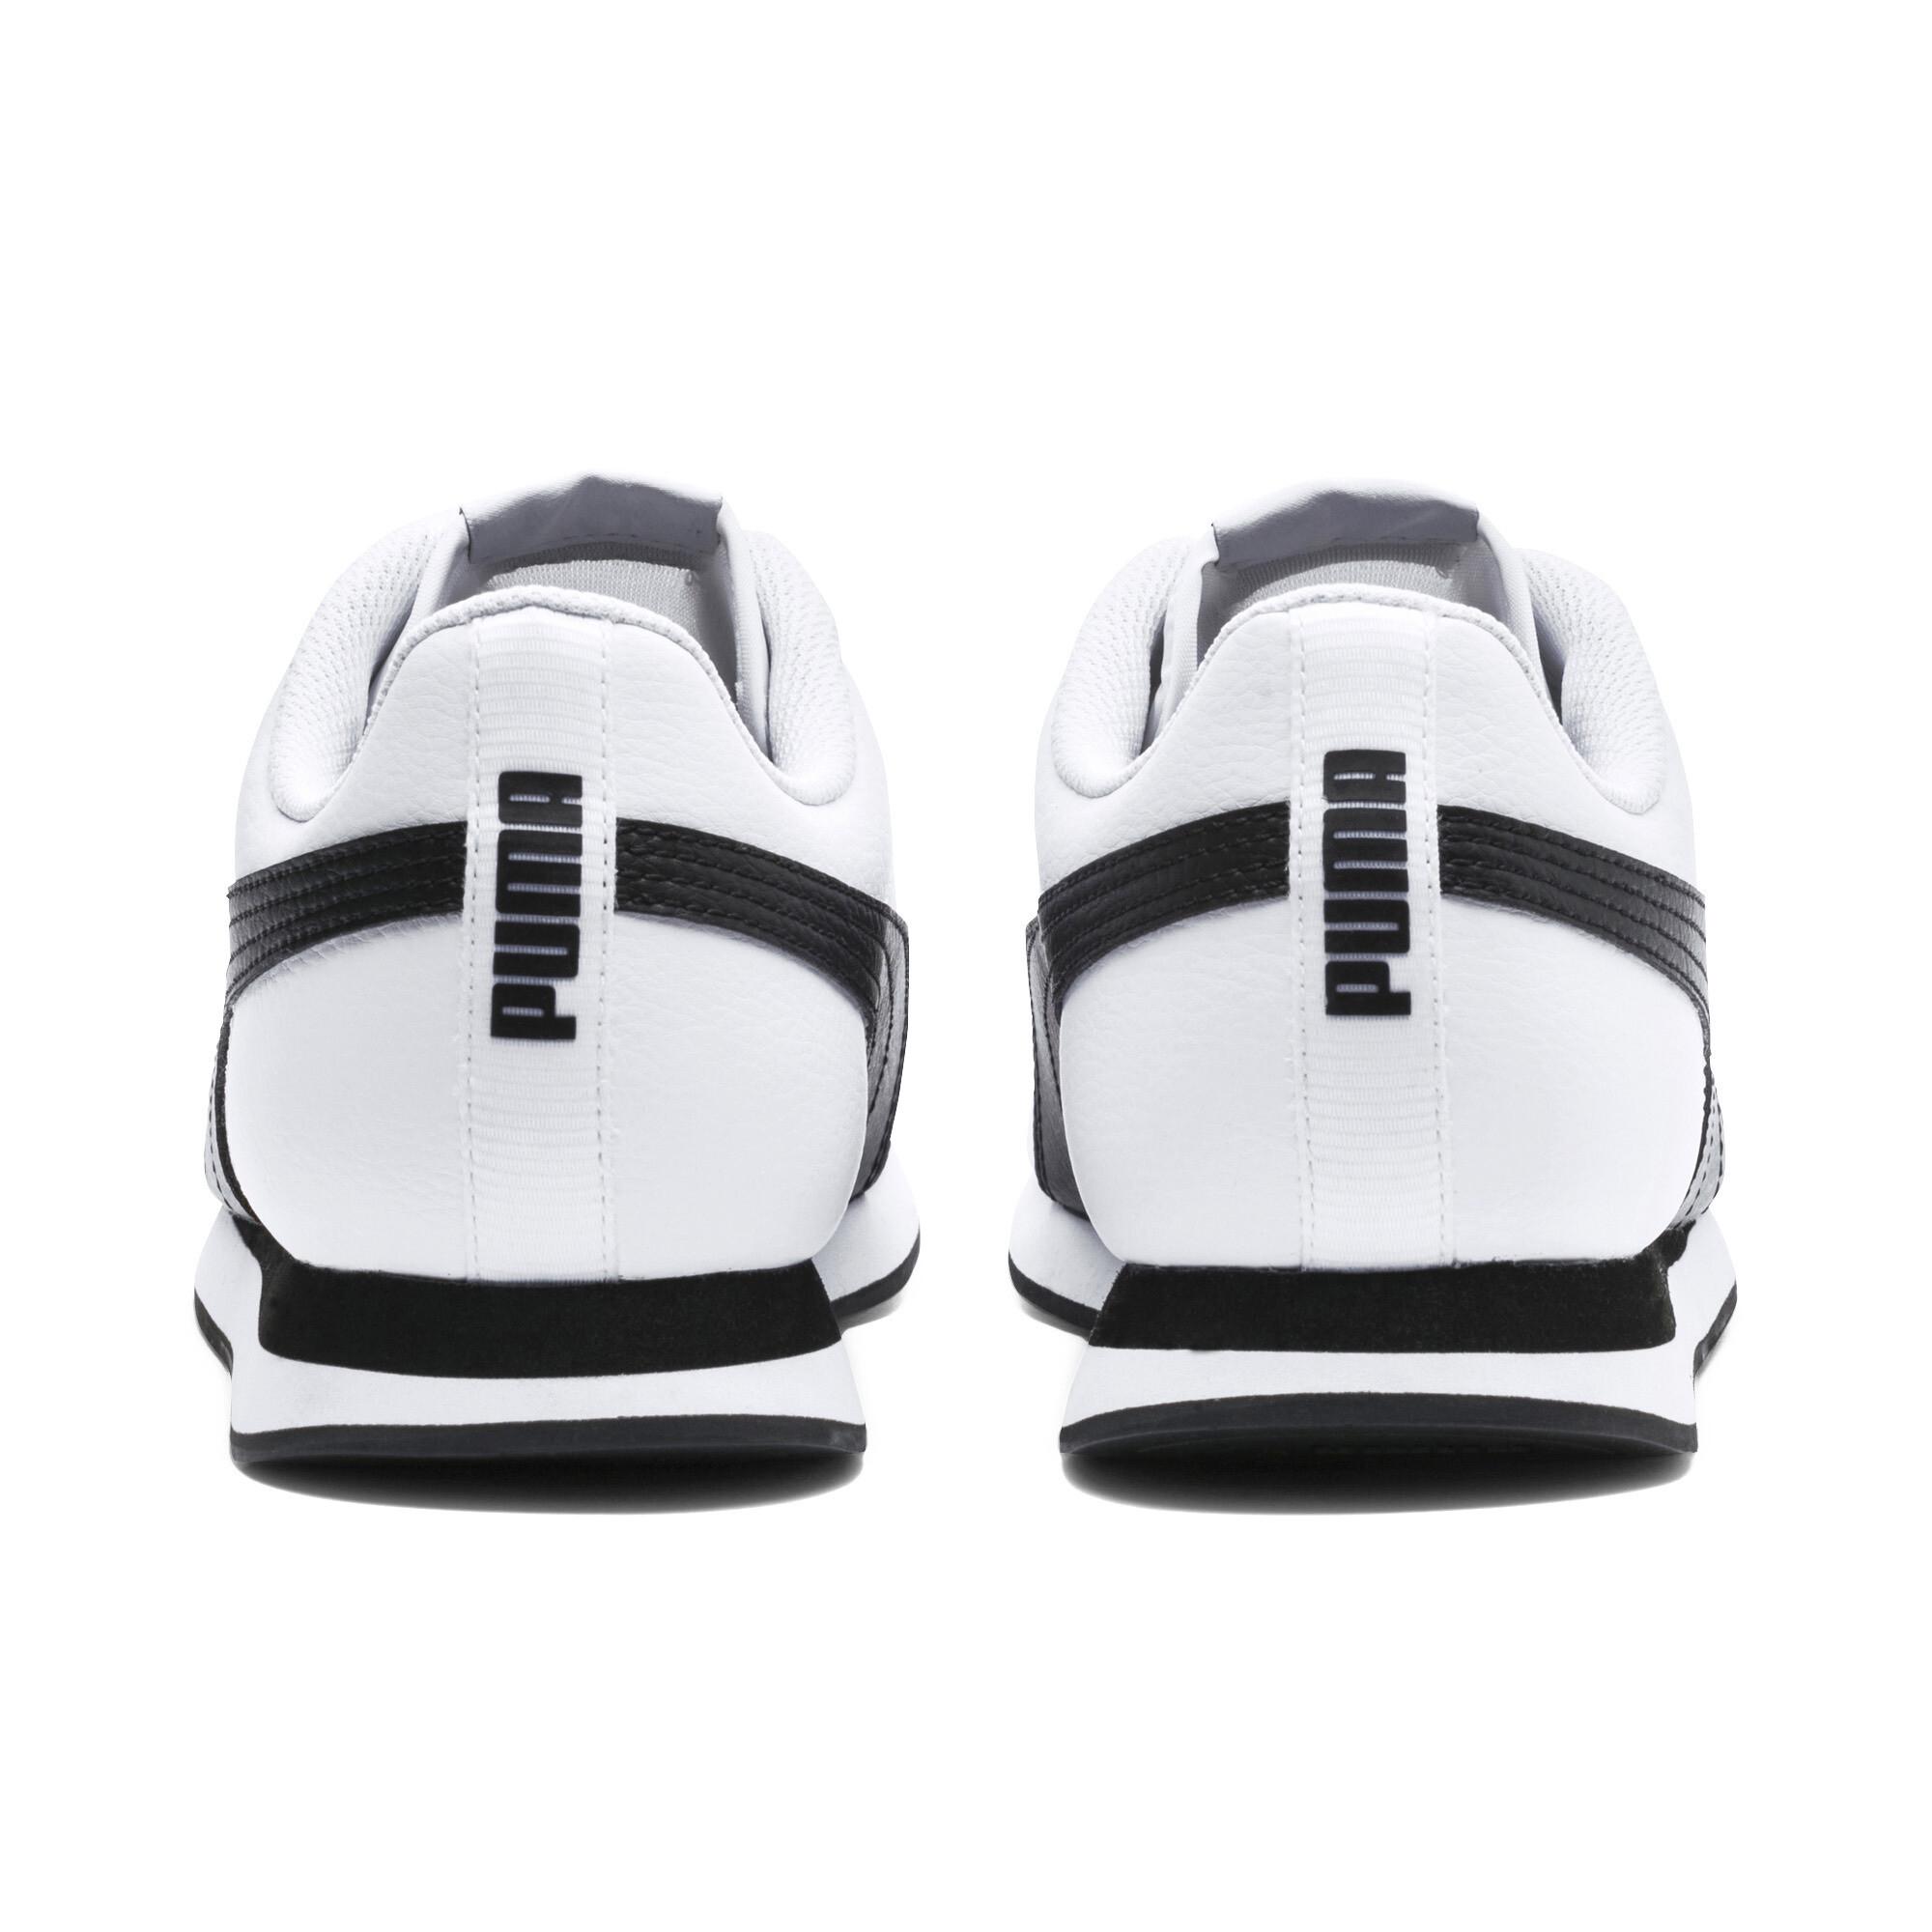 thumbnail 11 - PUMA Men's Turin II Sneakers